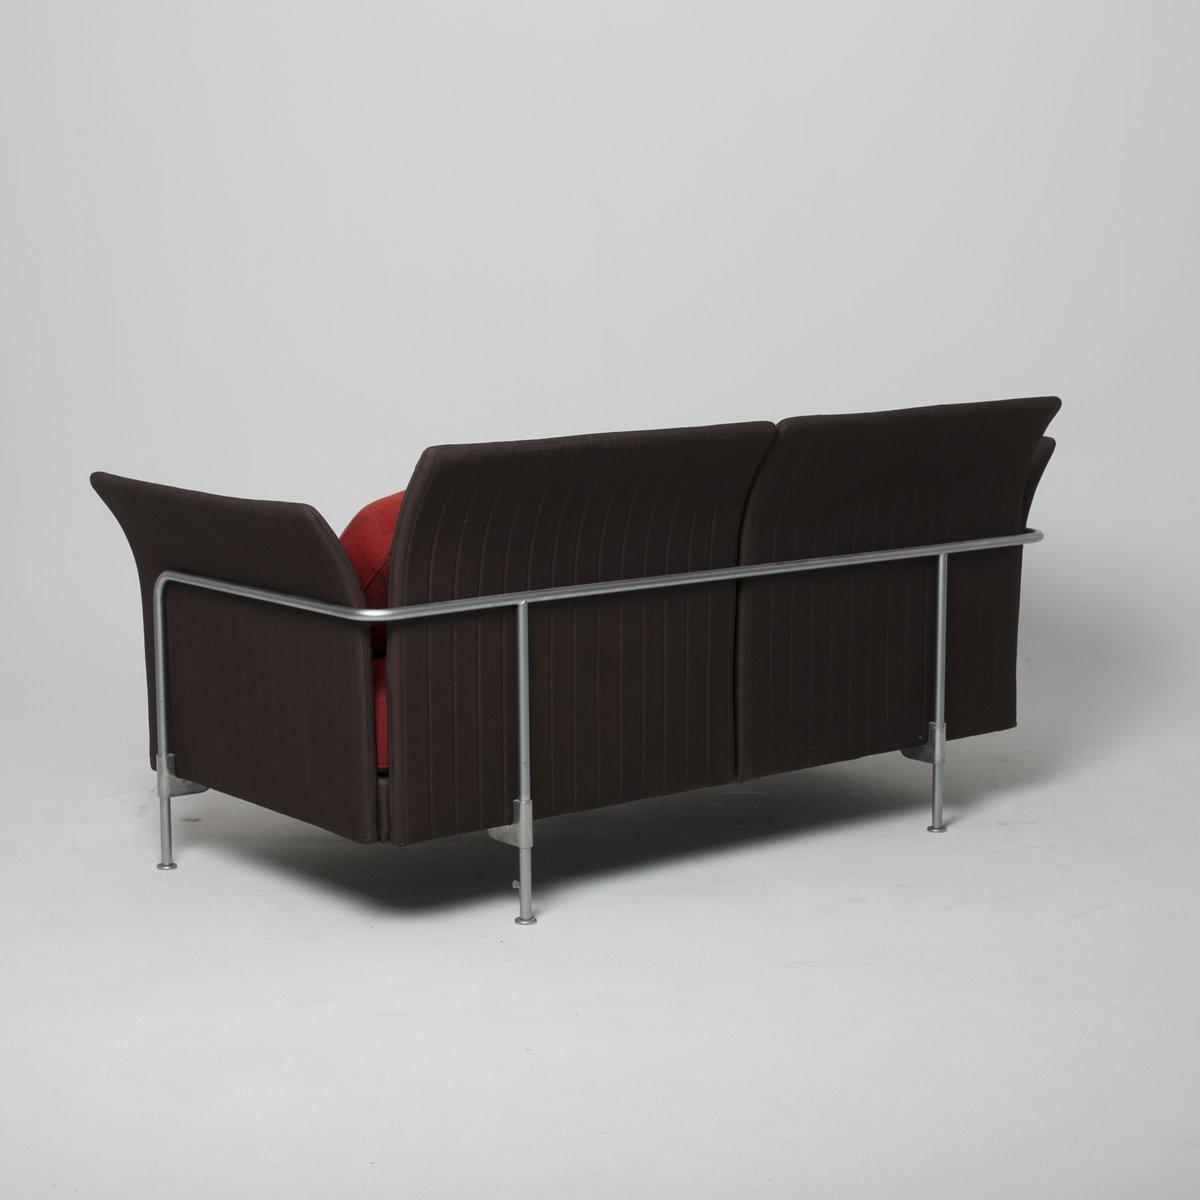 Canap sofa von ronan erwan bouroullec f r vitra bei - Console canape ...